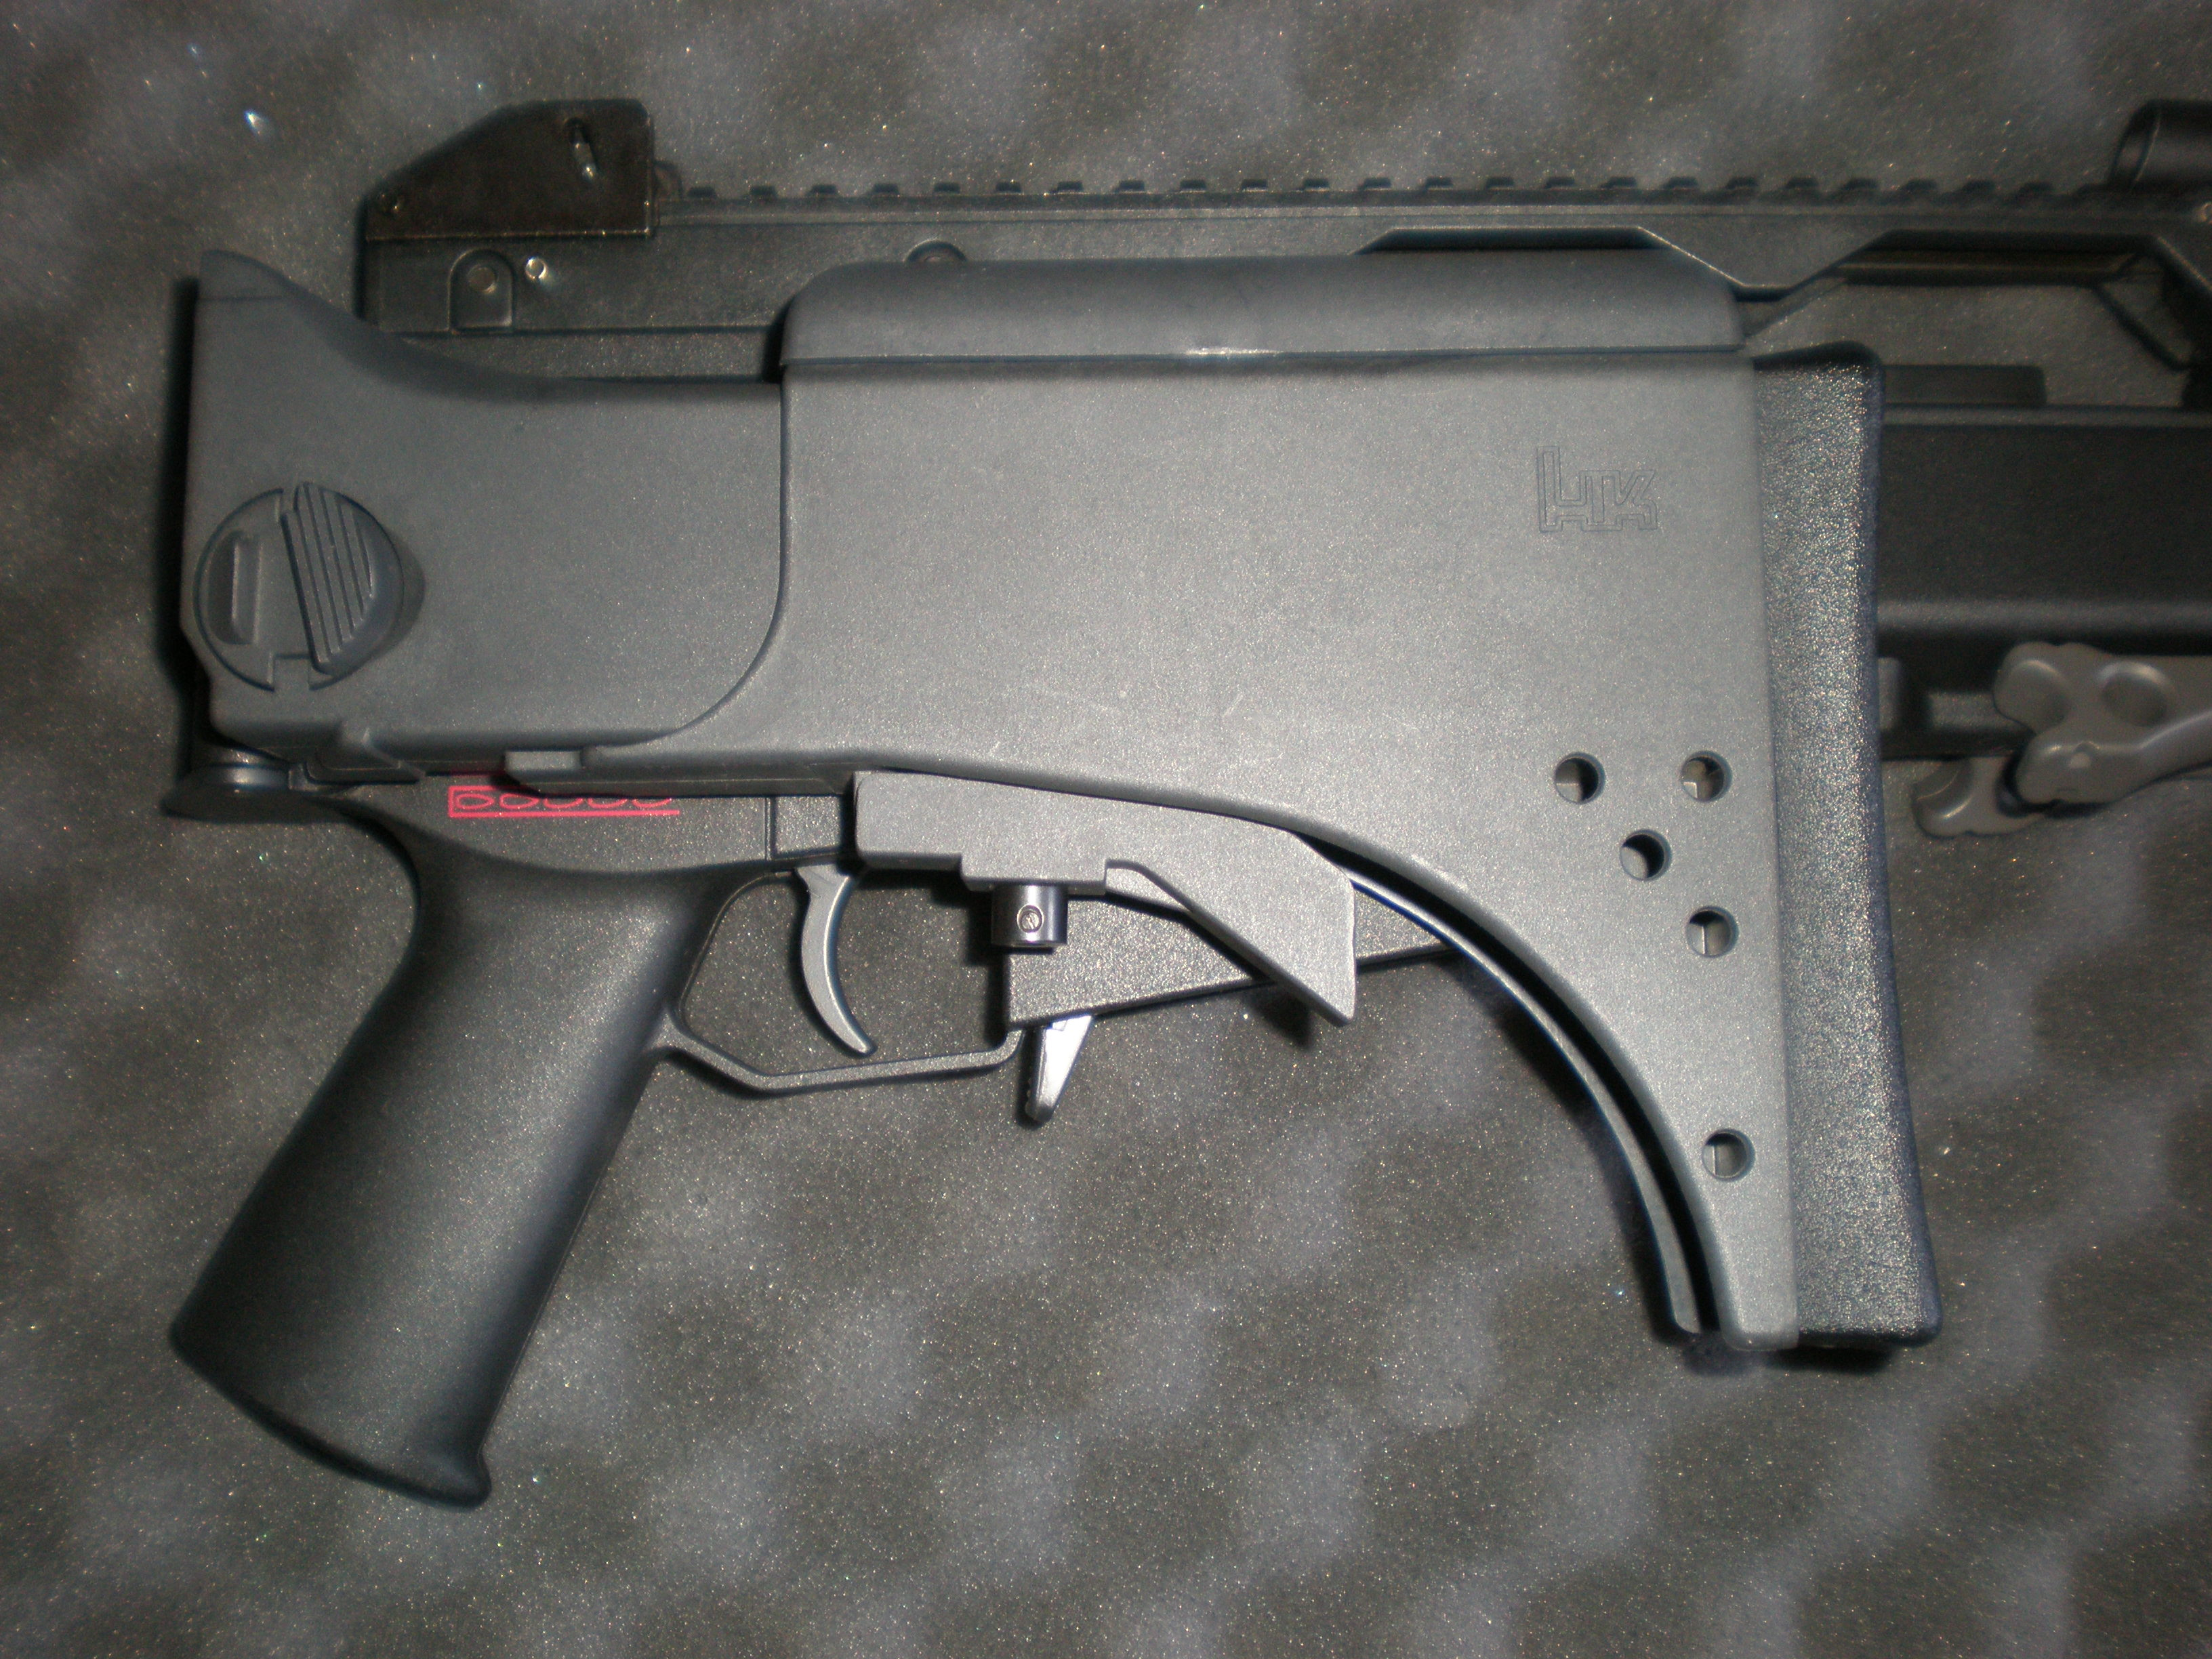 File:Airsoft MG36 stock folded.JPG - Wikimedia Commons | 3264 x 2448 jpeg 1508kB